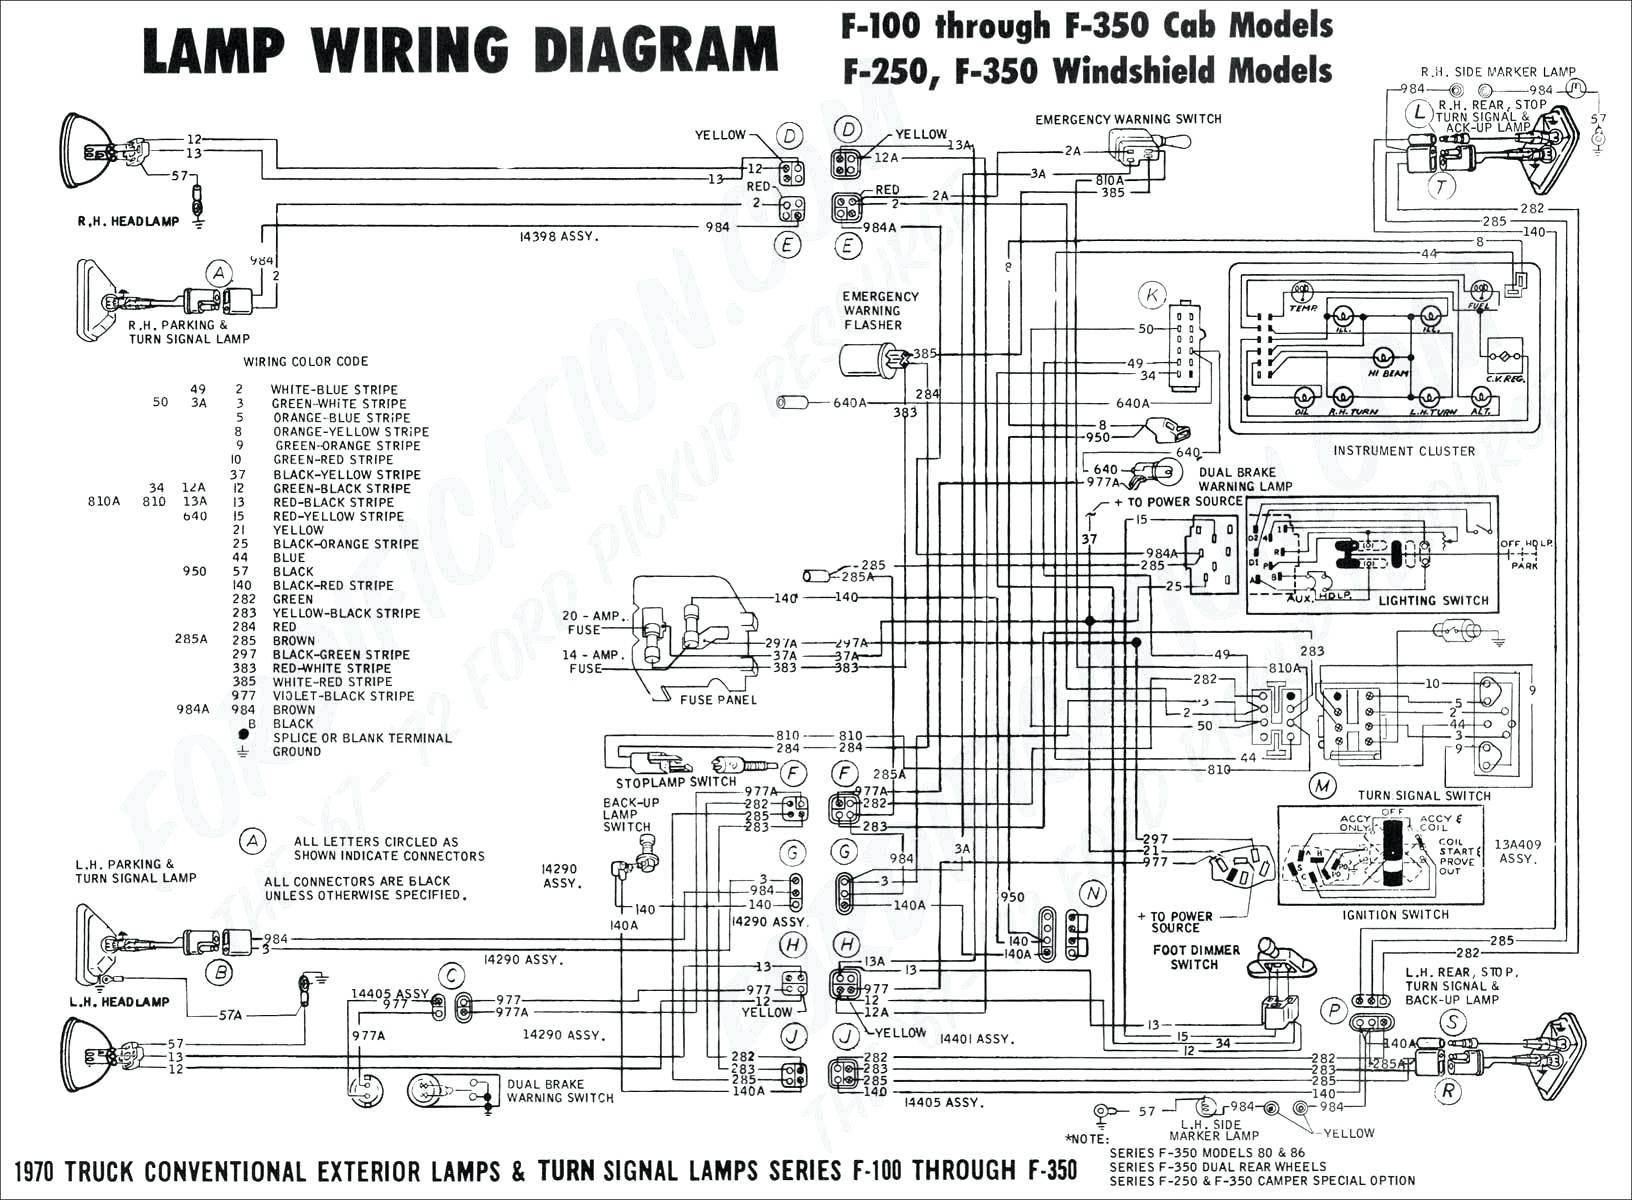 2003 Gmc Sonoma Fuse Diagram